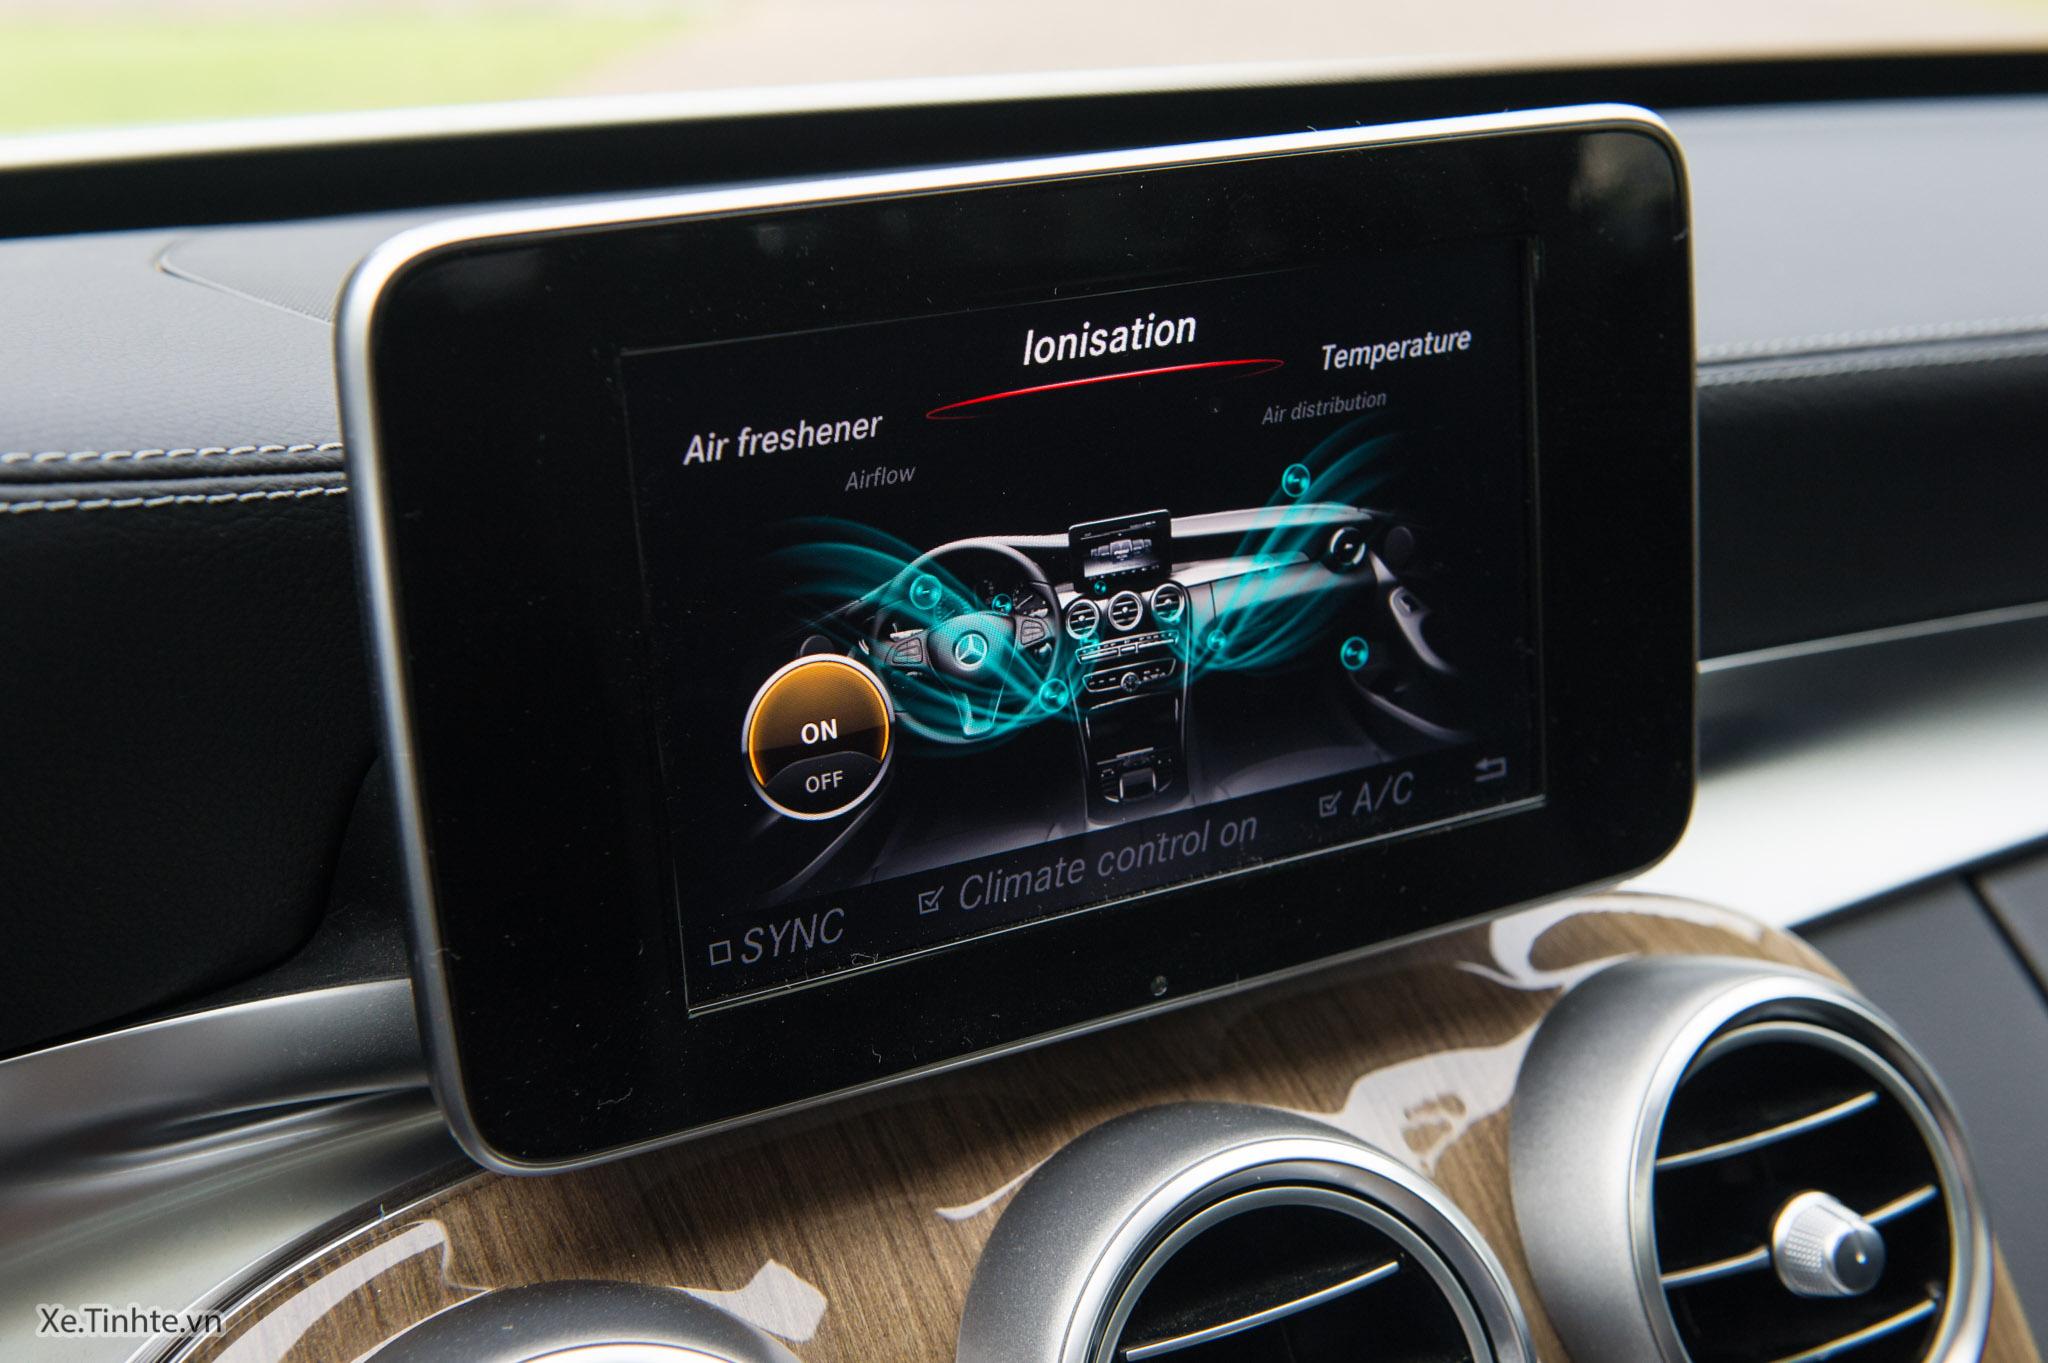 Mercedes_C250 Exclusive_Xe.tinhte.vn-7267.jpg